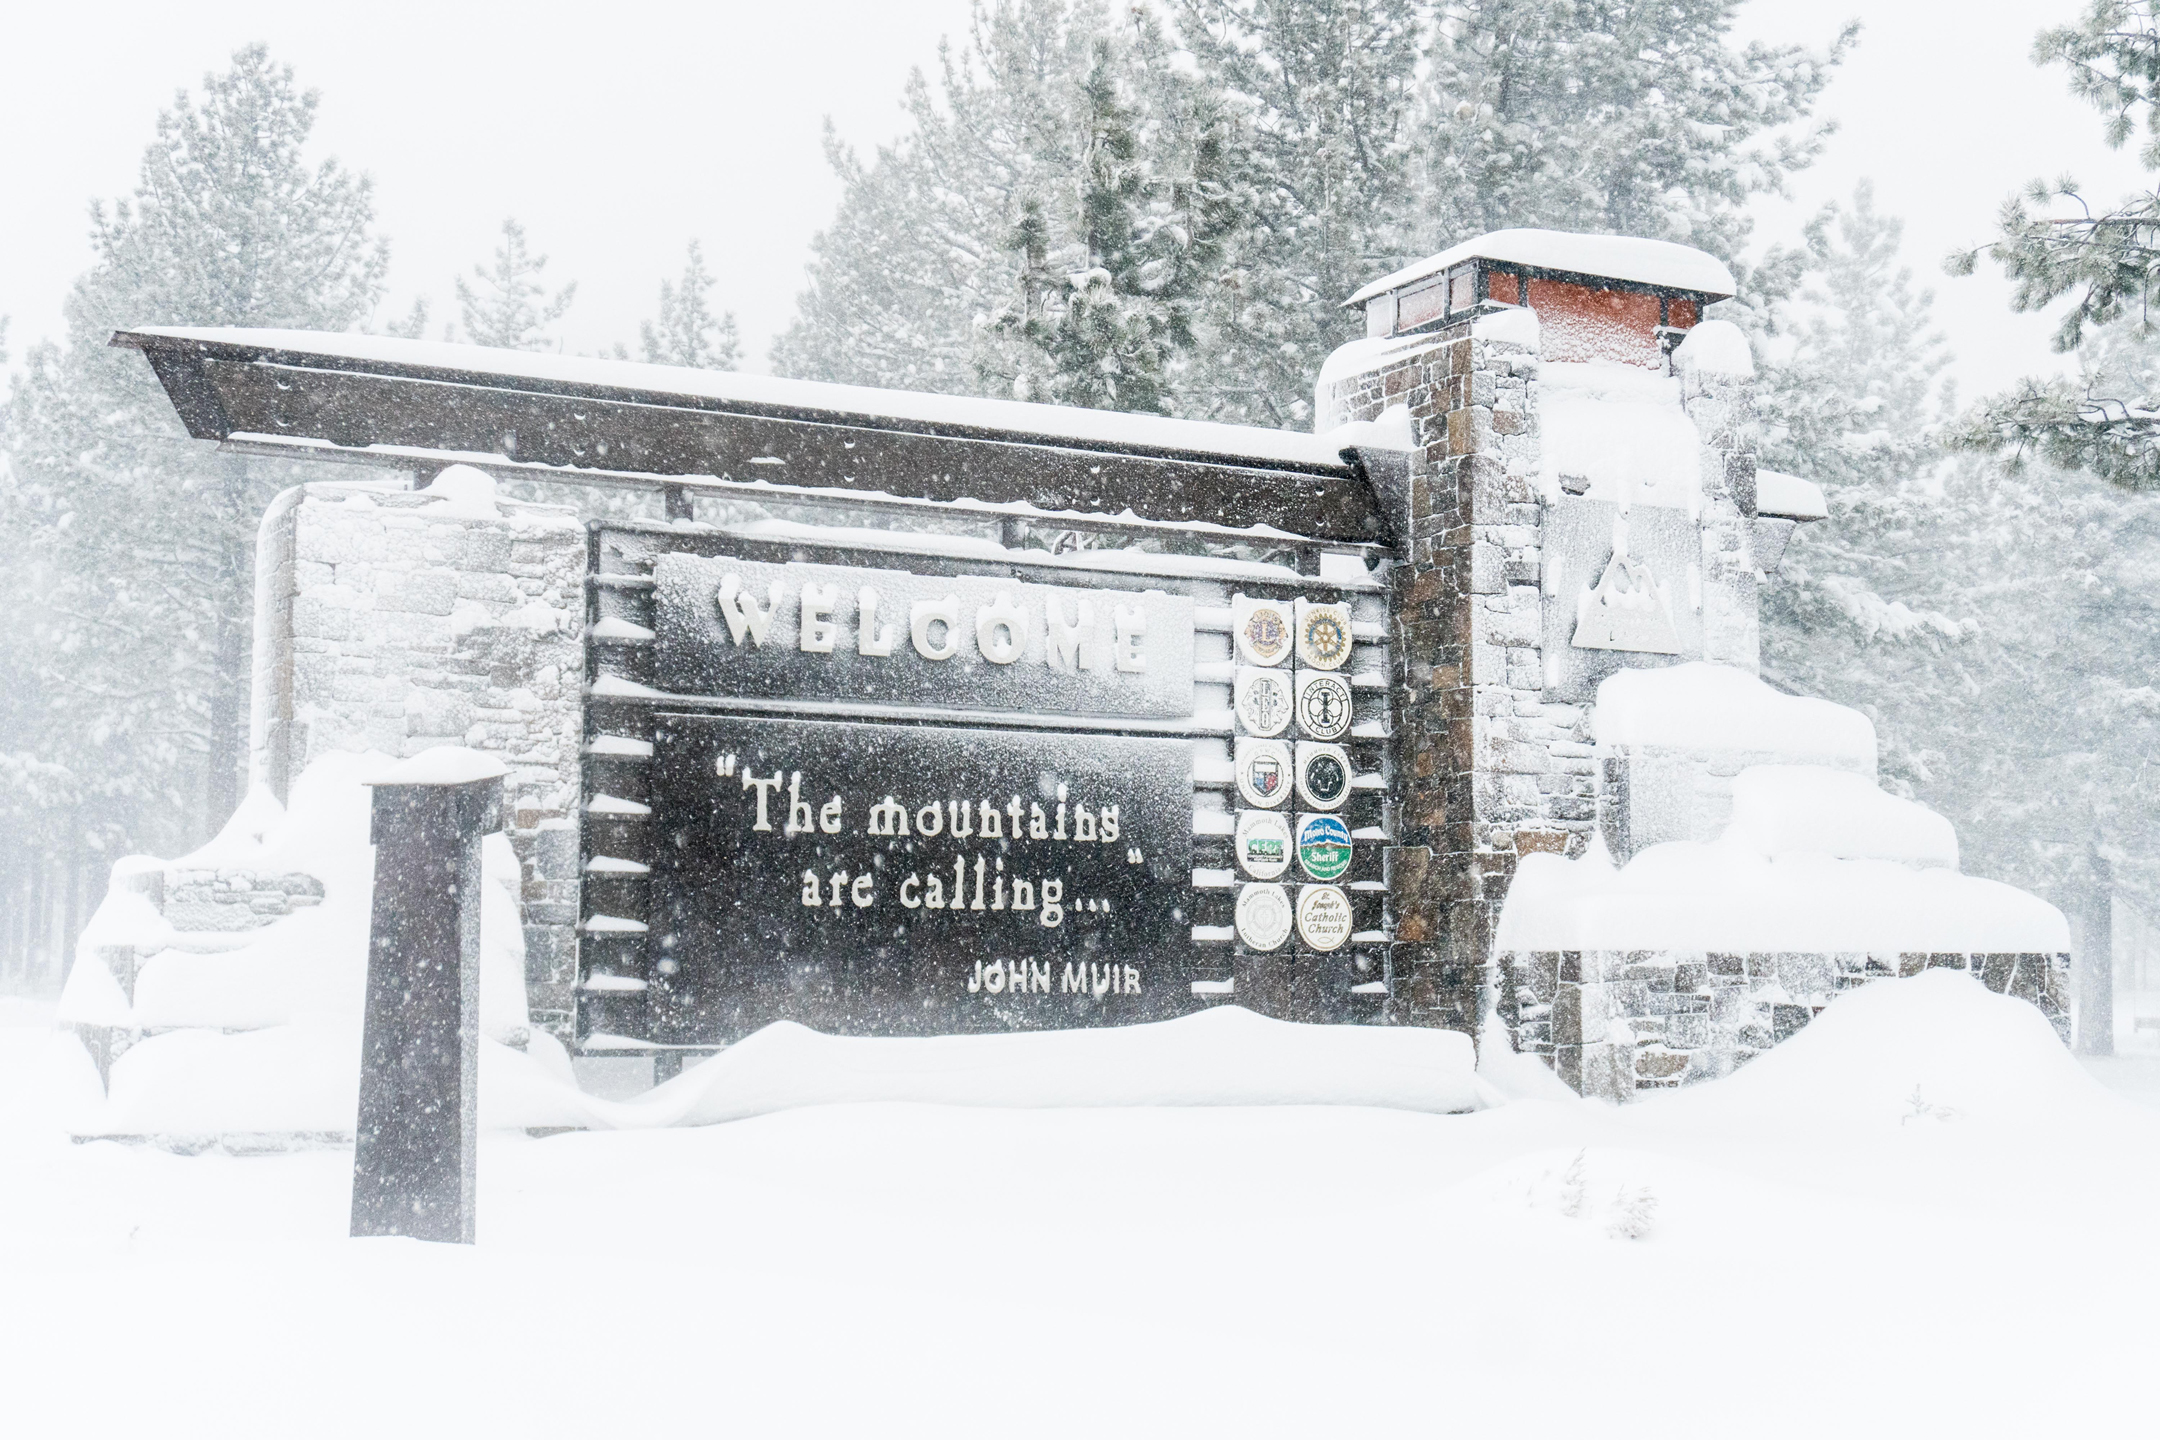 2017-01-04-Winter-New-Snow-WRAY-34.jpg